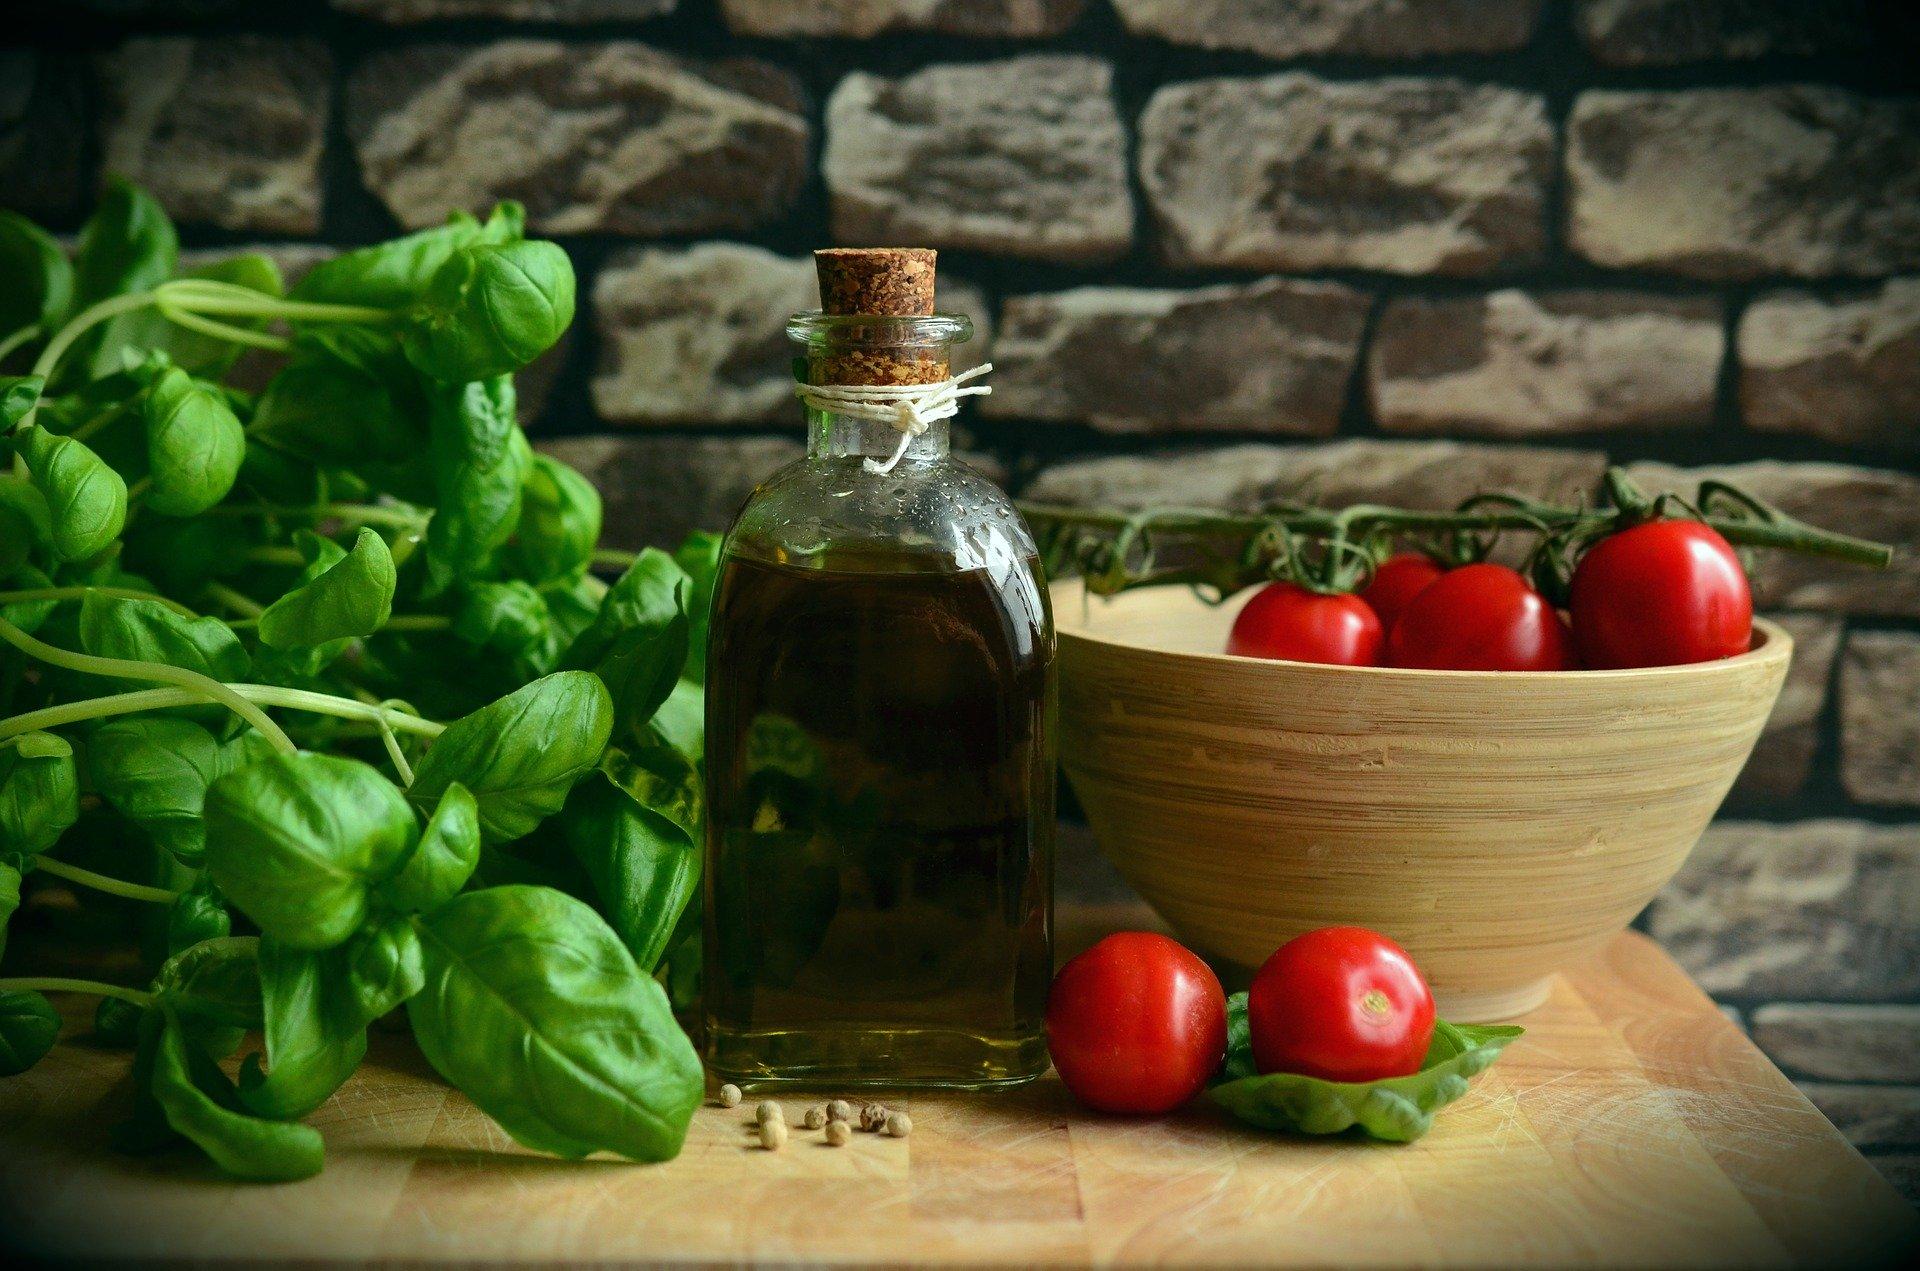 mesa-habla-aceite-oliva-dieta-mediterranea